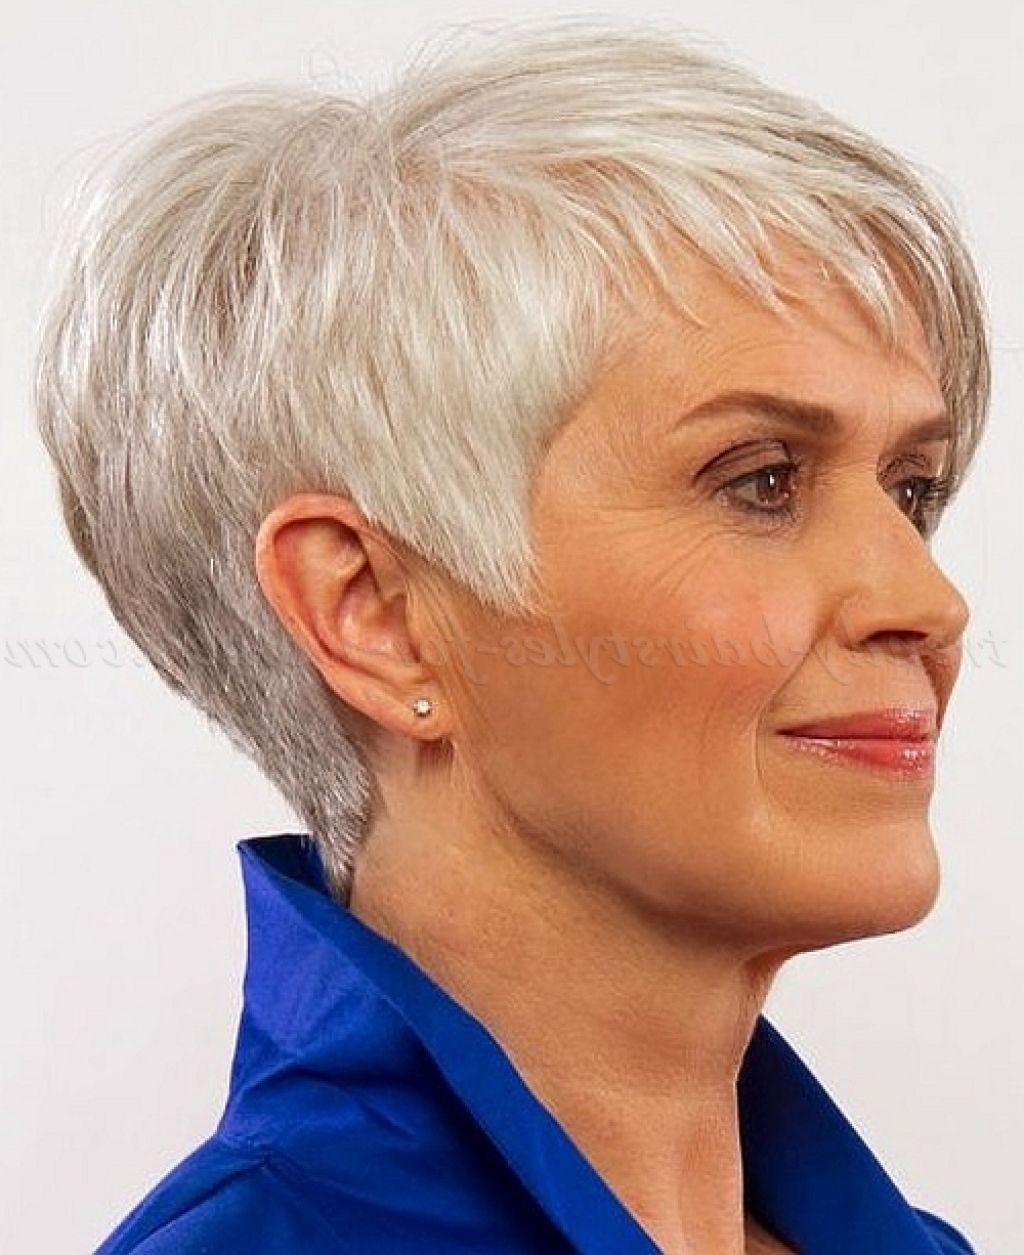 10 Easy Short Hairstyles For Women Over 60 Women Hairstyle Shorthairstyles Thick Hair Styles Short Hair Styles Short Hair With Layers